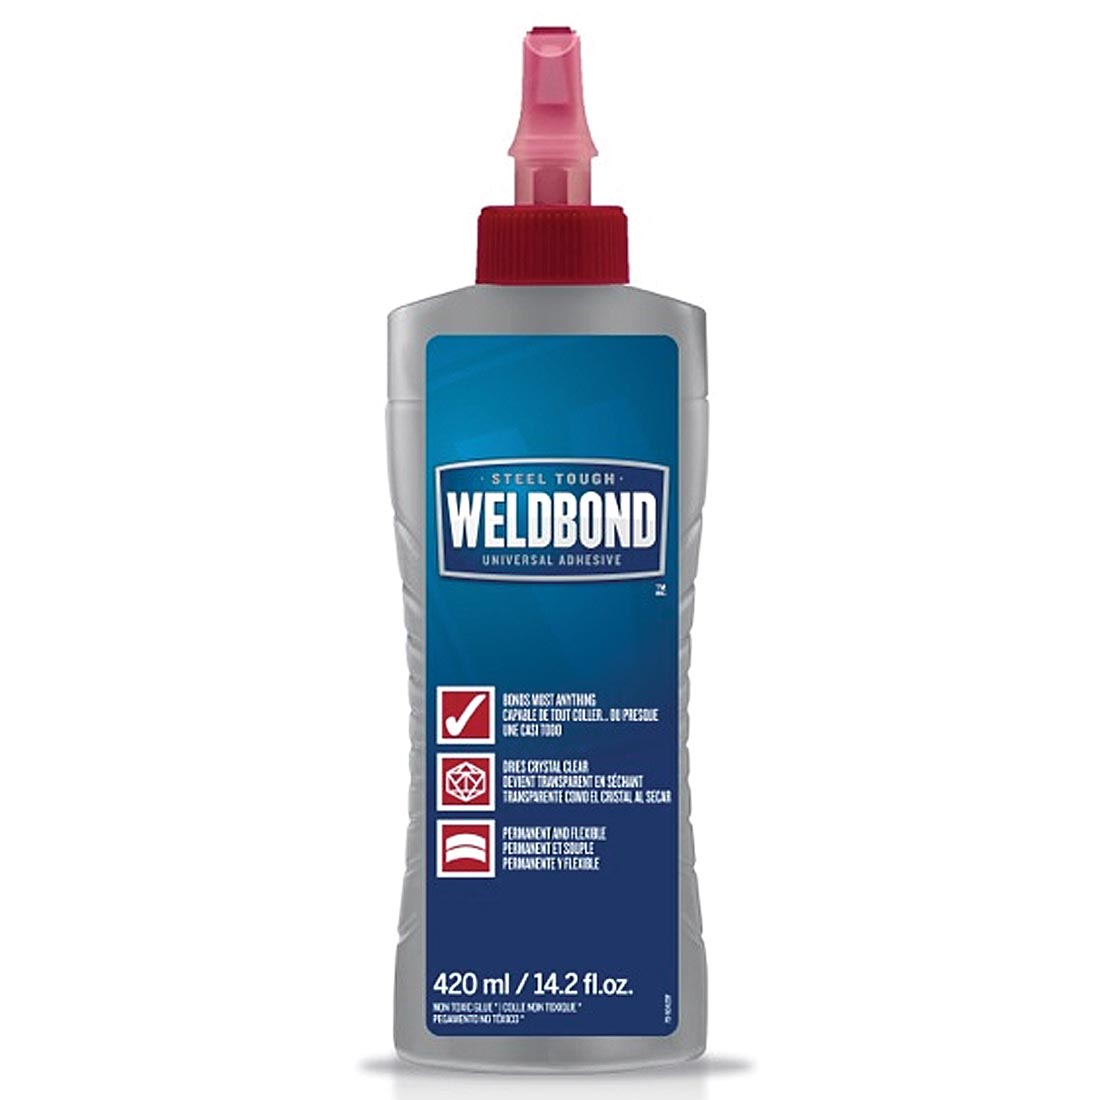 F. T. Ross 185 Weldbond All-Purpose Glue-8OZ WELDBOND GLUE